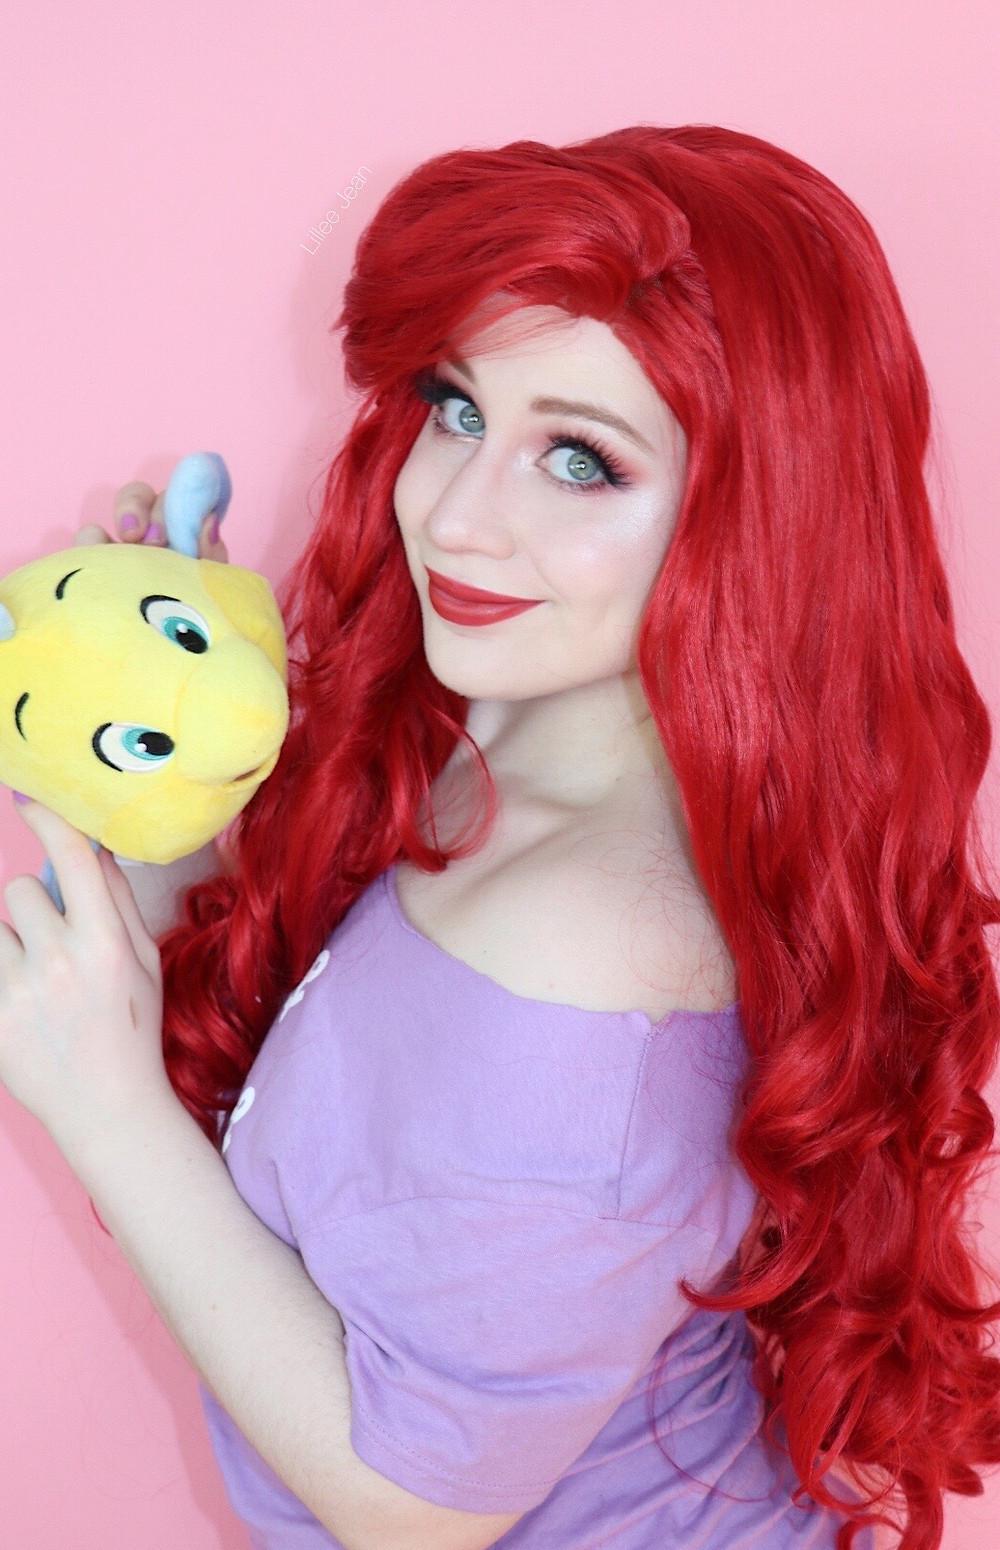 Disney Princess Ariel Makeup by Lillee Jean